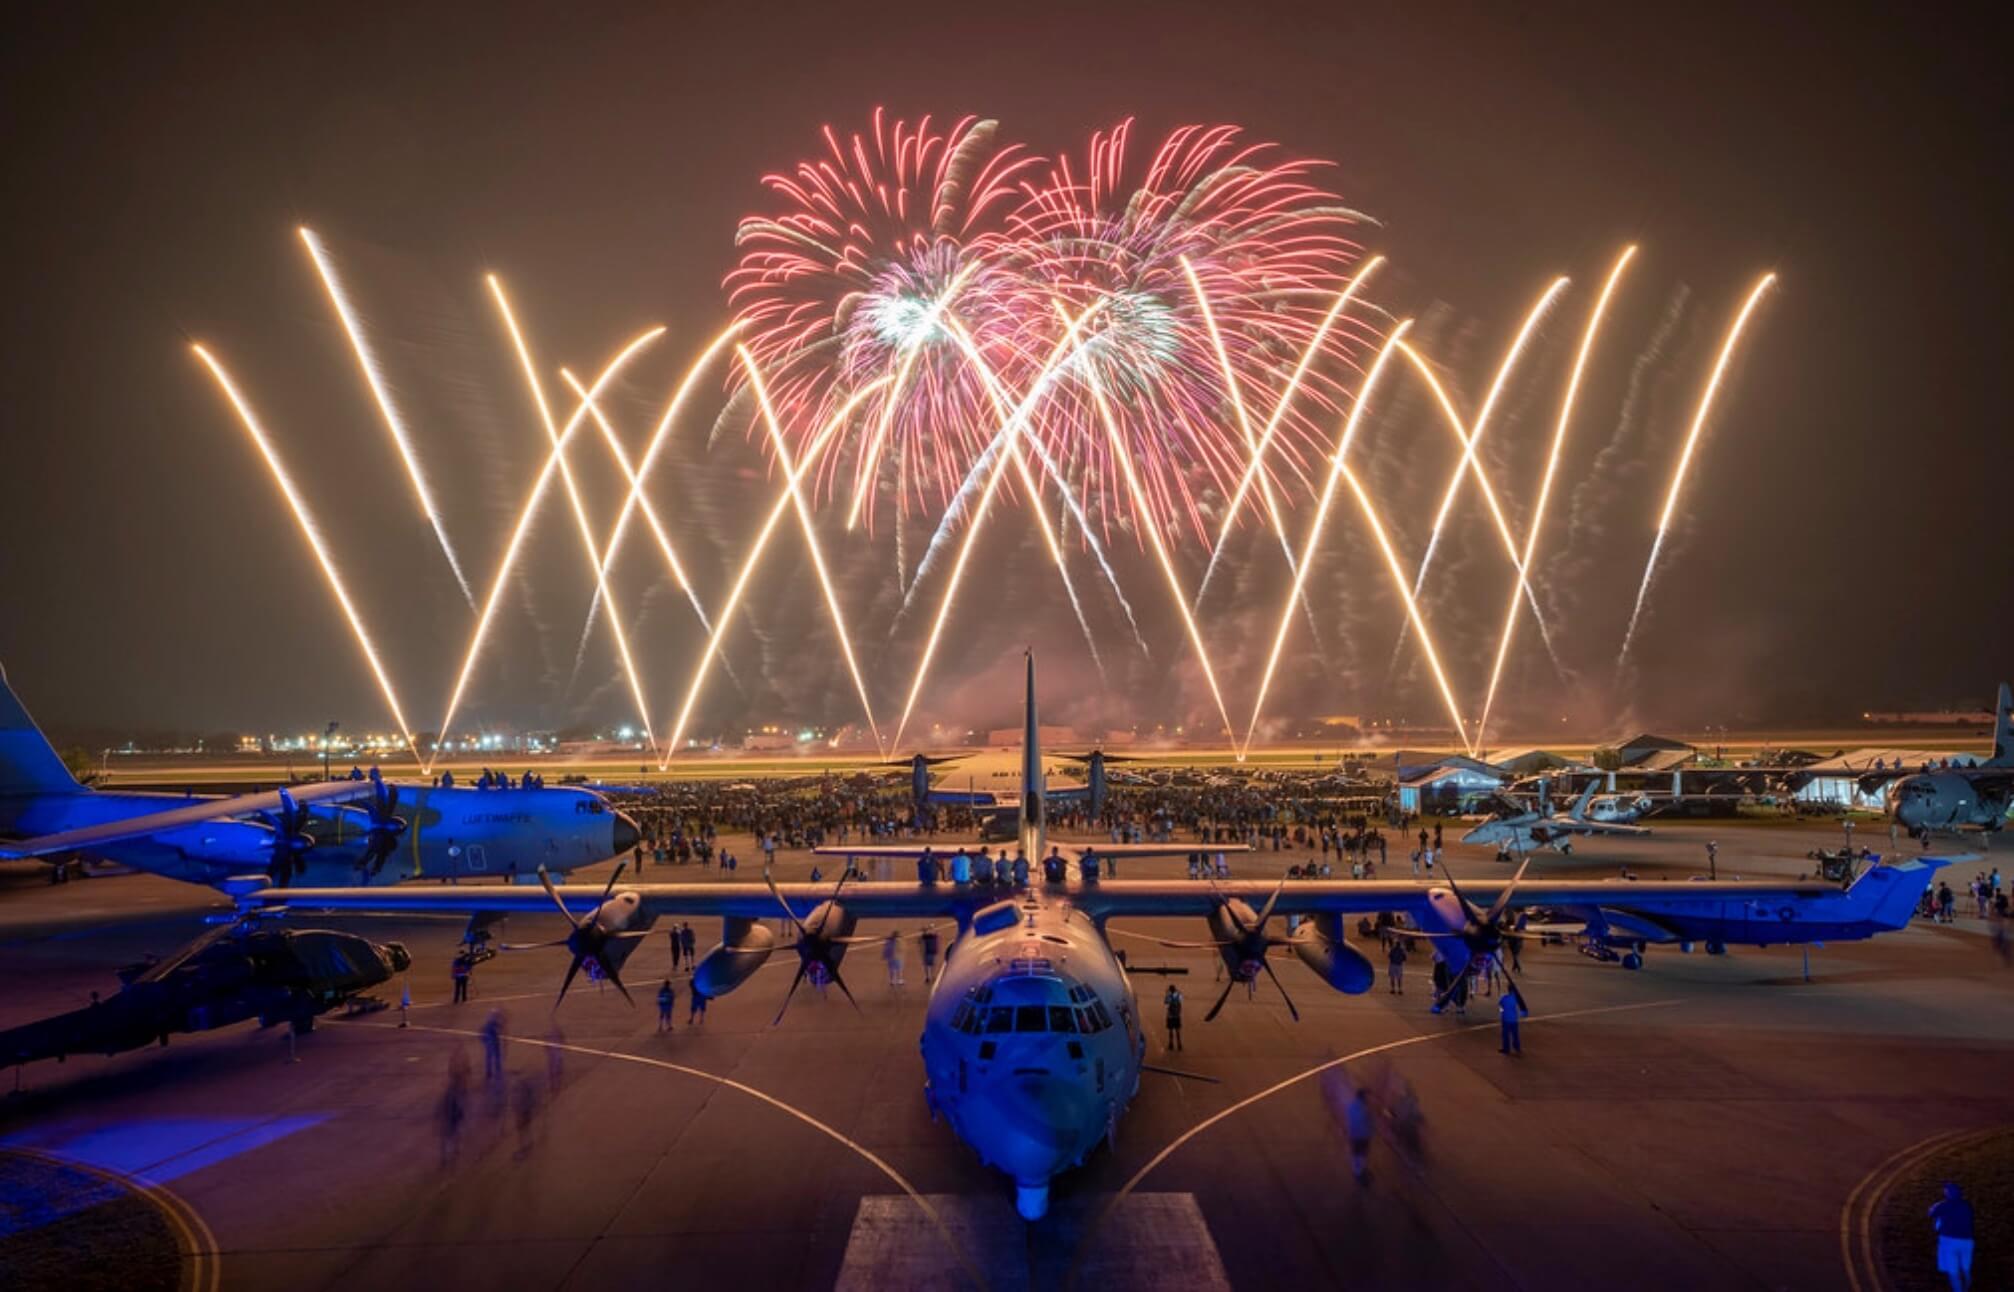 Oshkosh Air Venture 2021